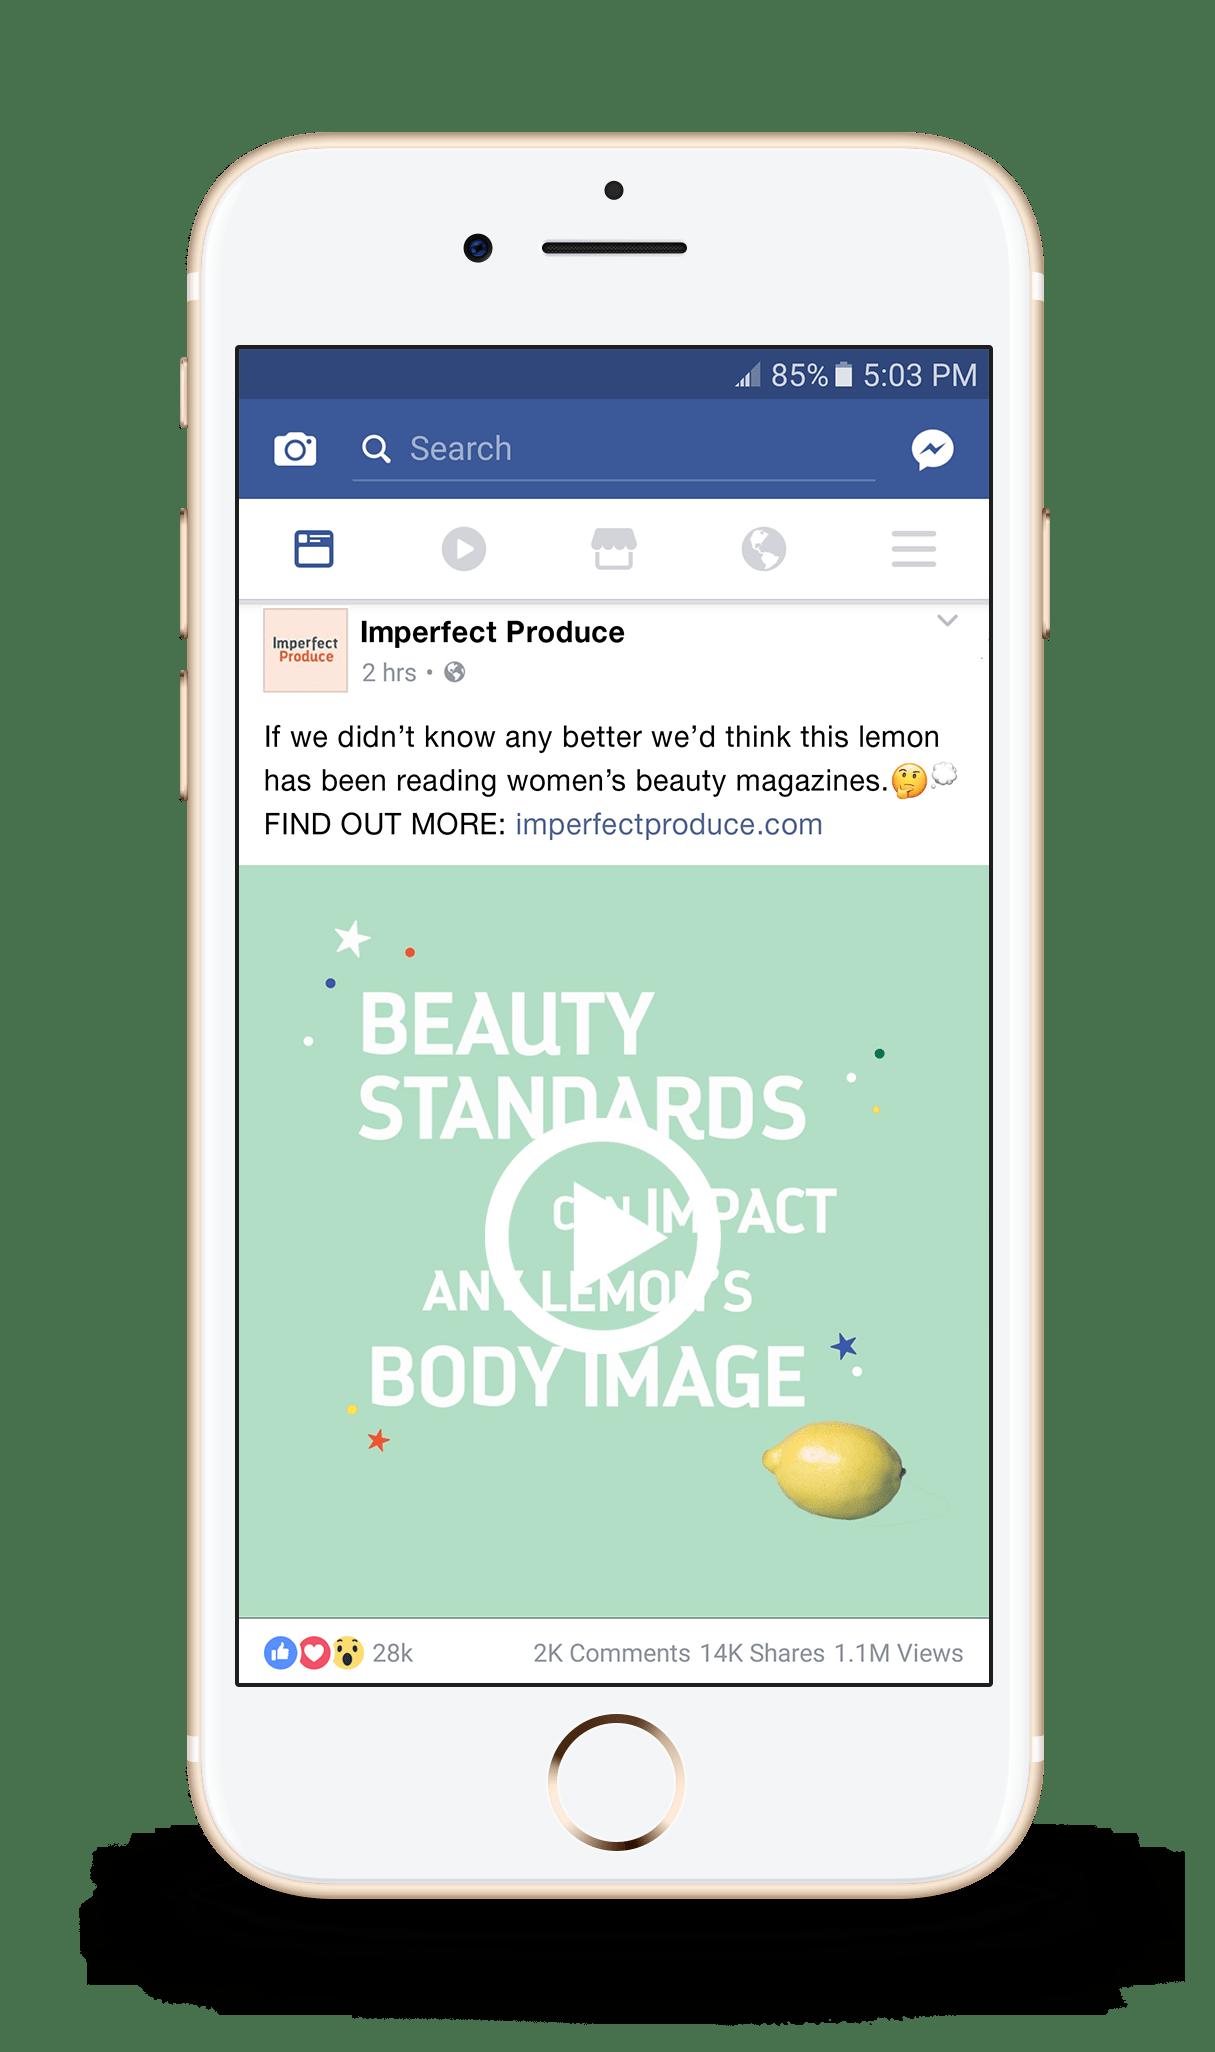 Facebook-Video-Post_Lemon-on-Phone-Mockup-1